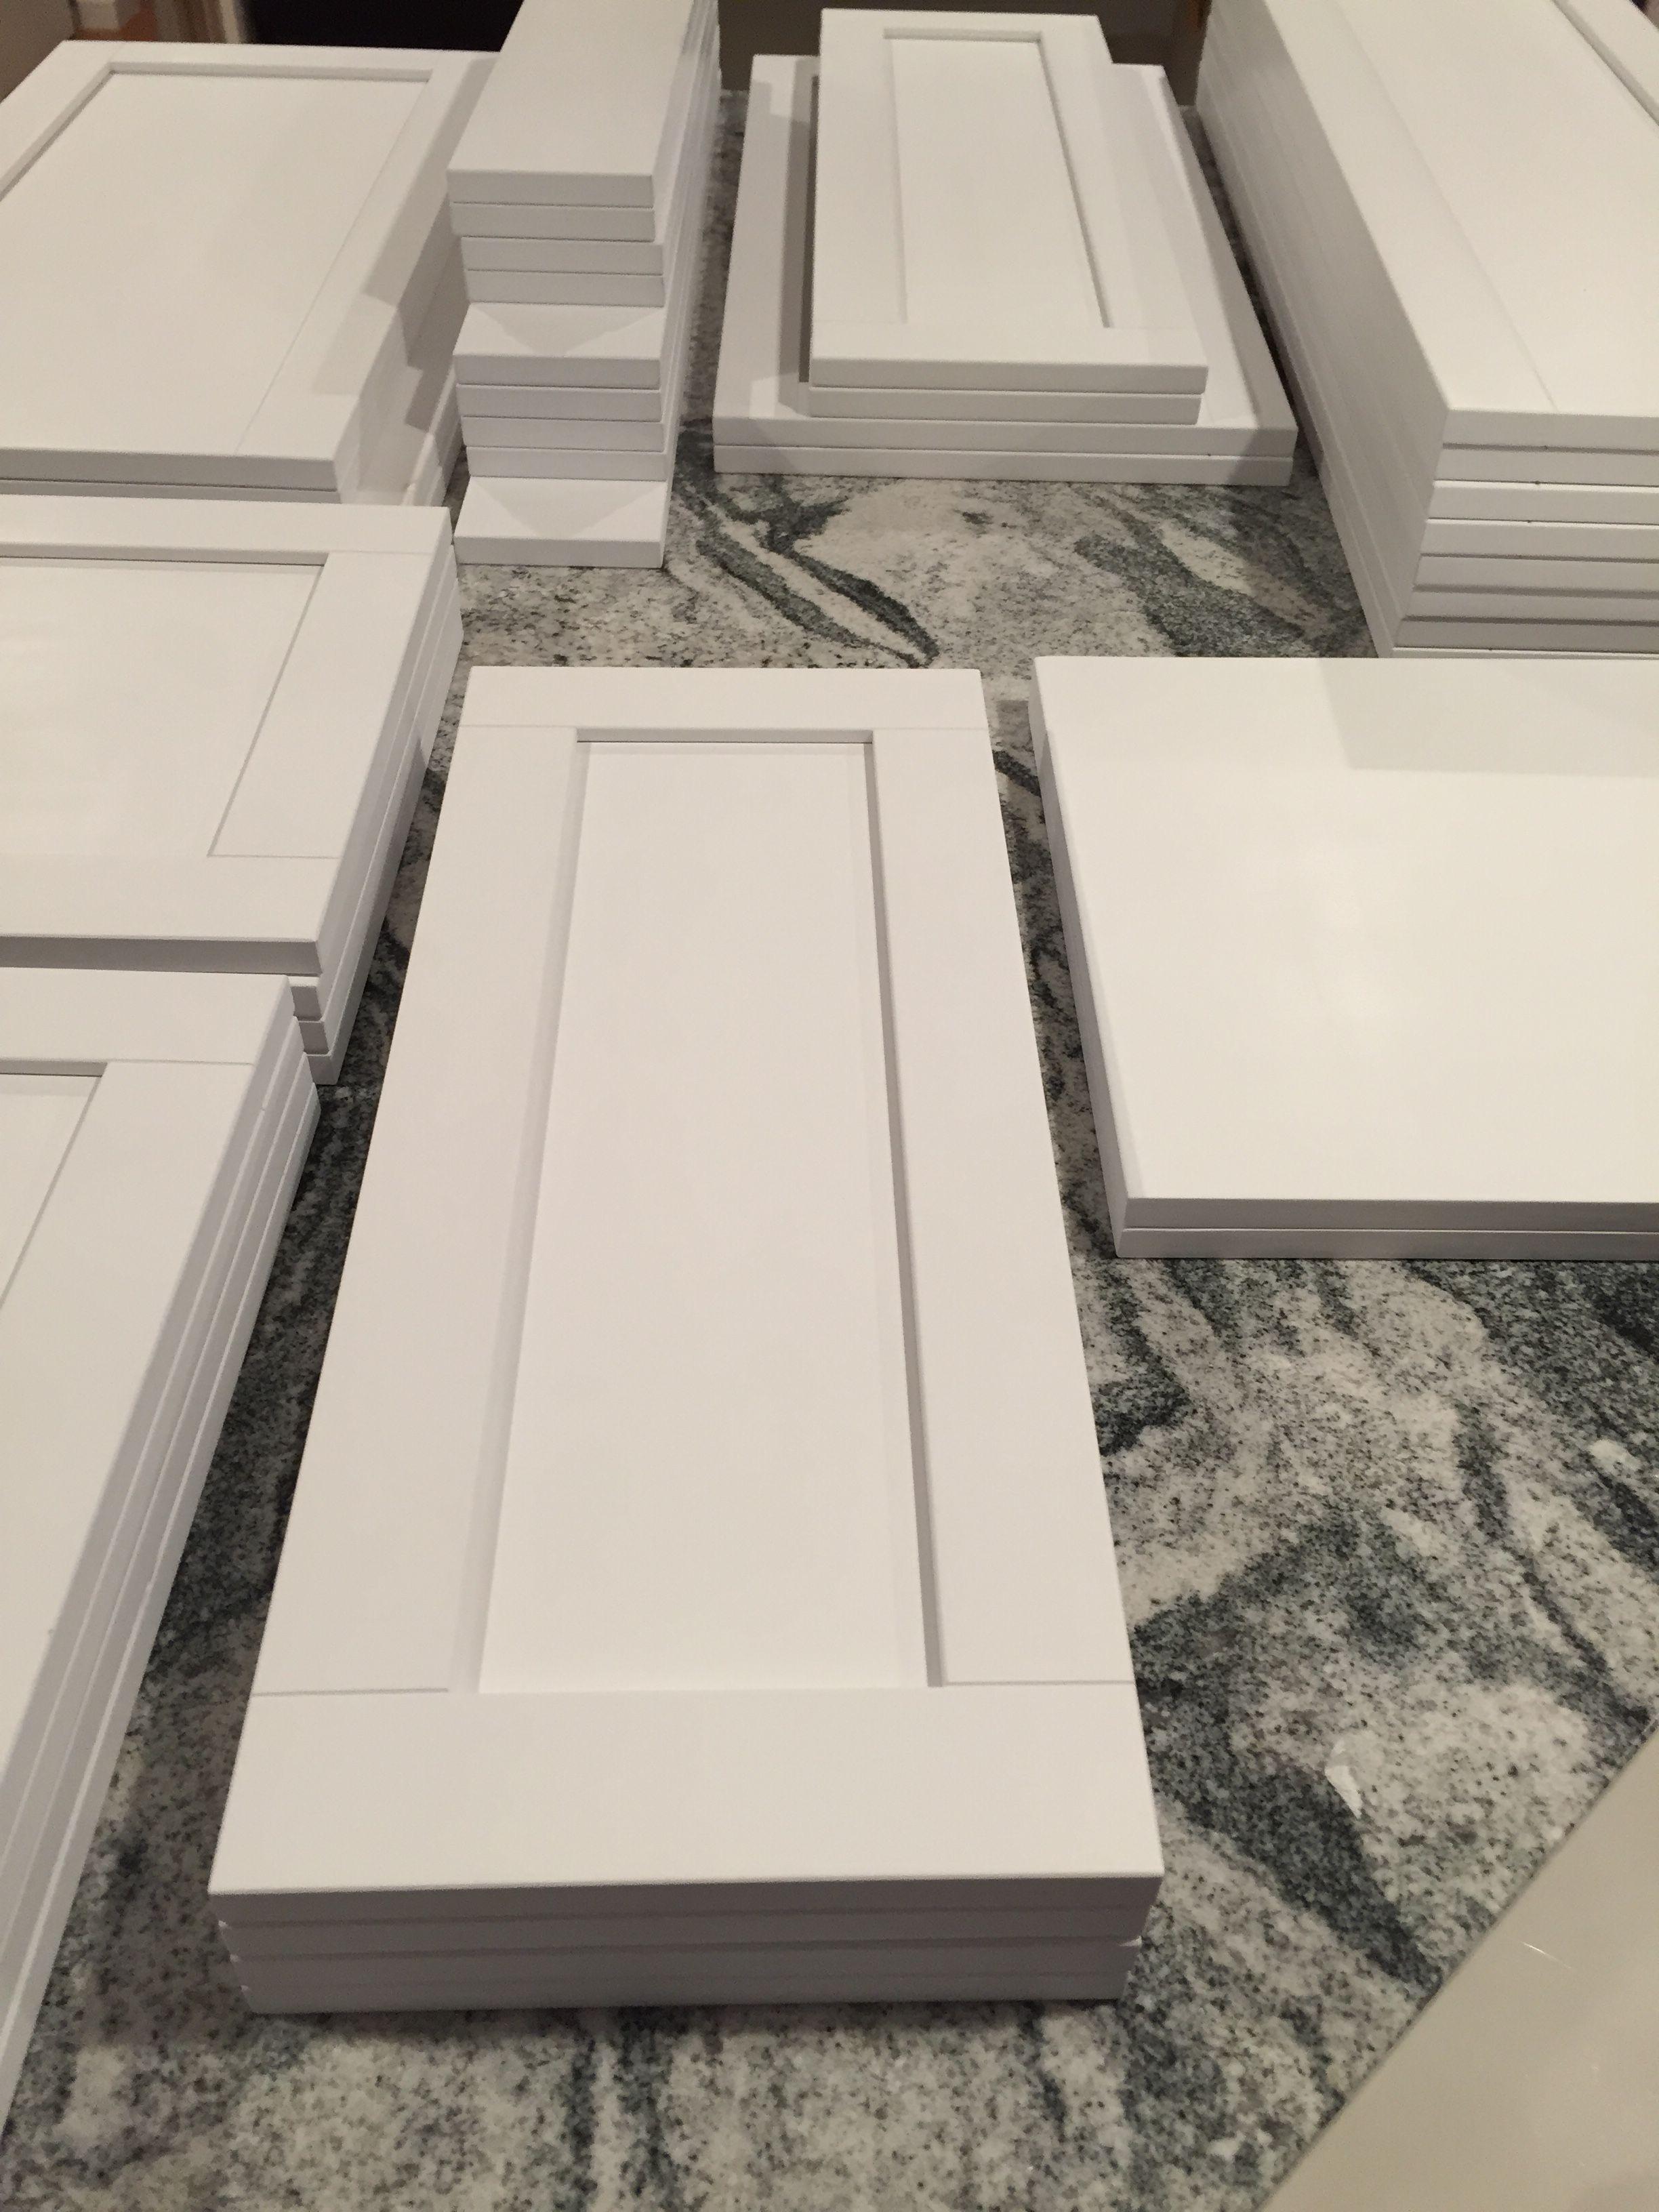 Ikea Bjorket Doors Primed And Sanded Ready For Paint Kitchen Remodel Pinterest Doors